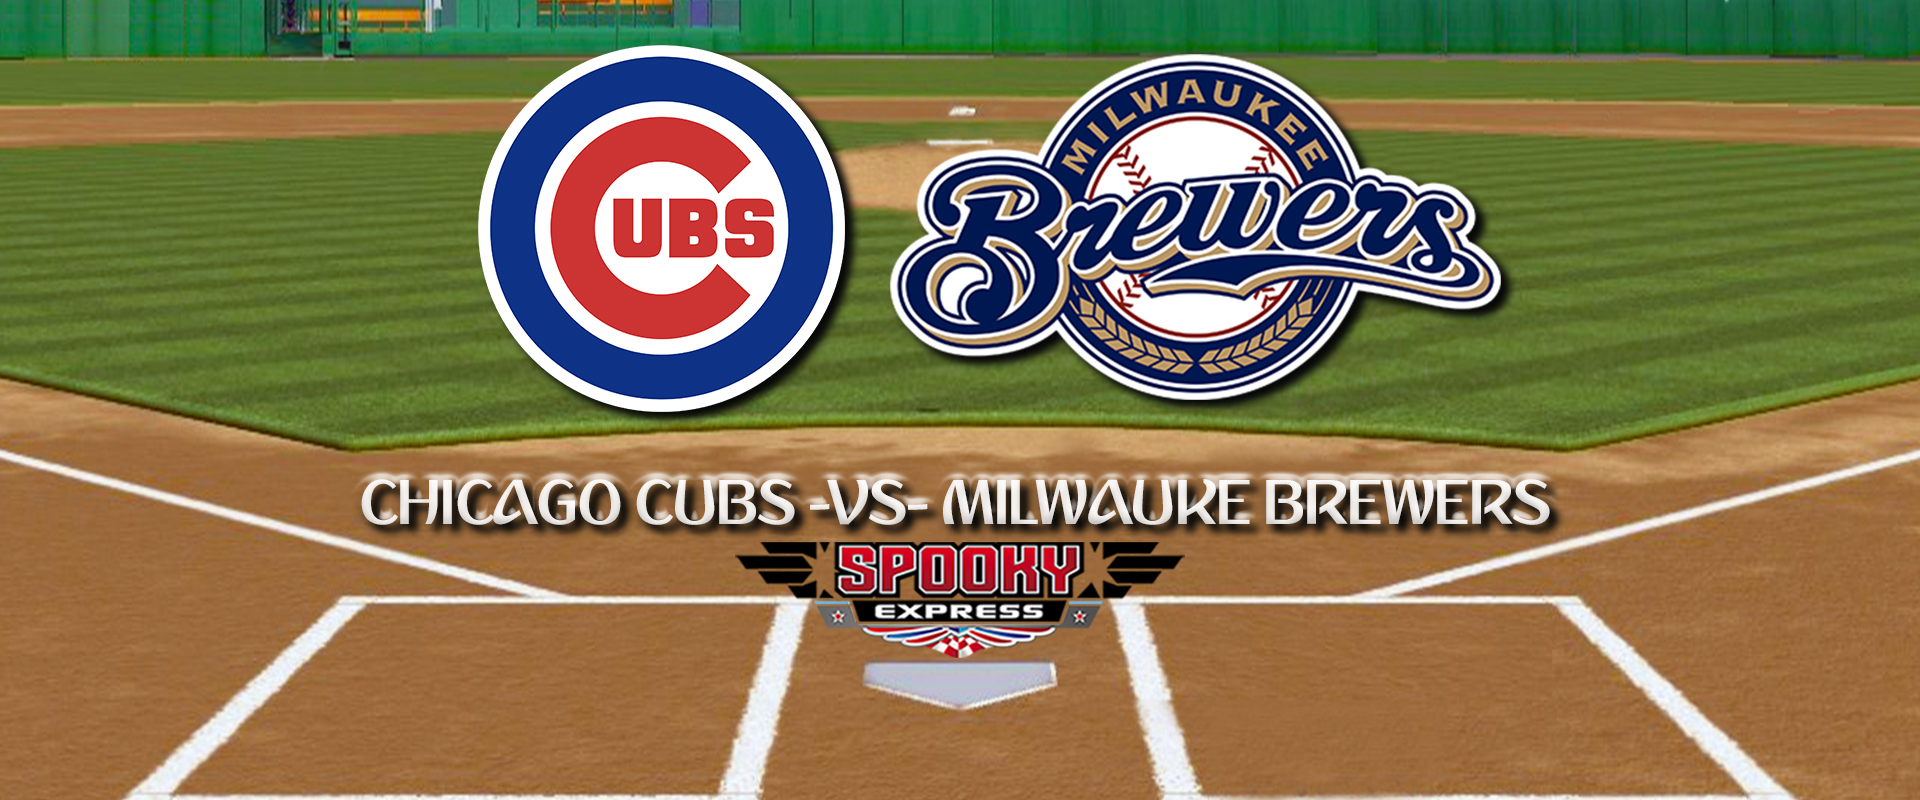 Brewers Vs Cubs June 12